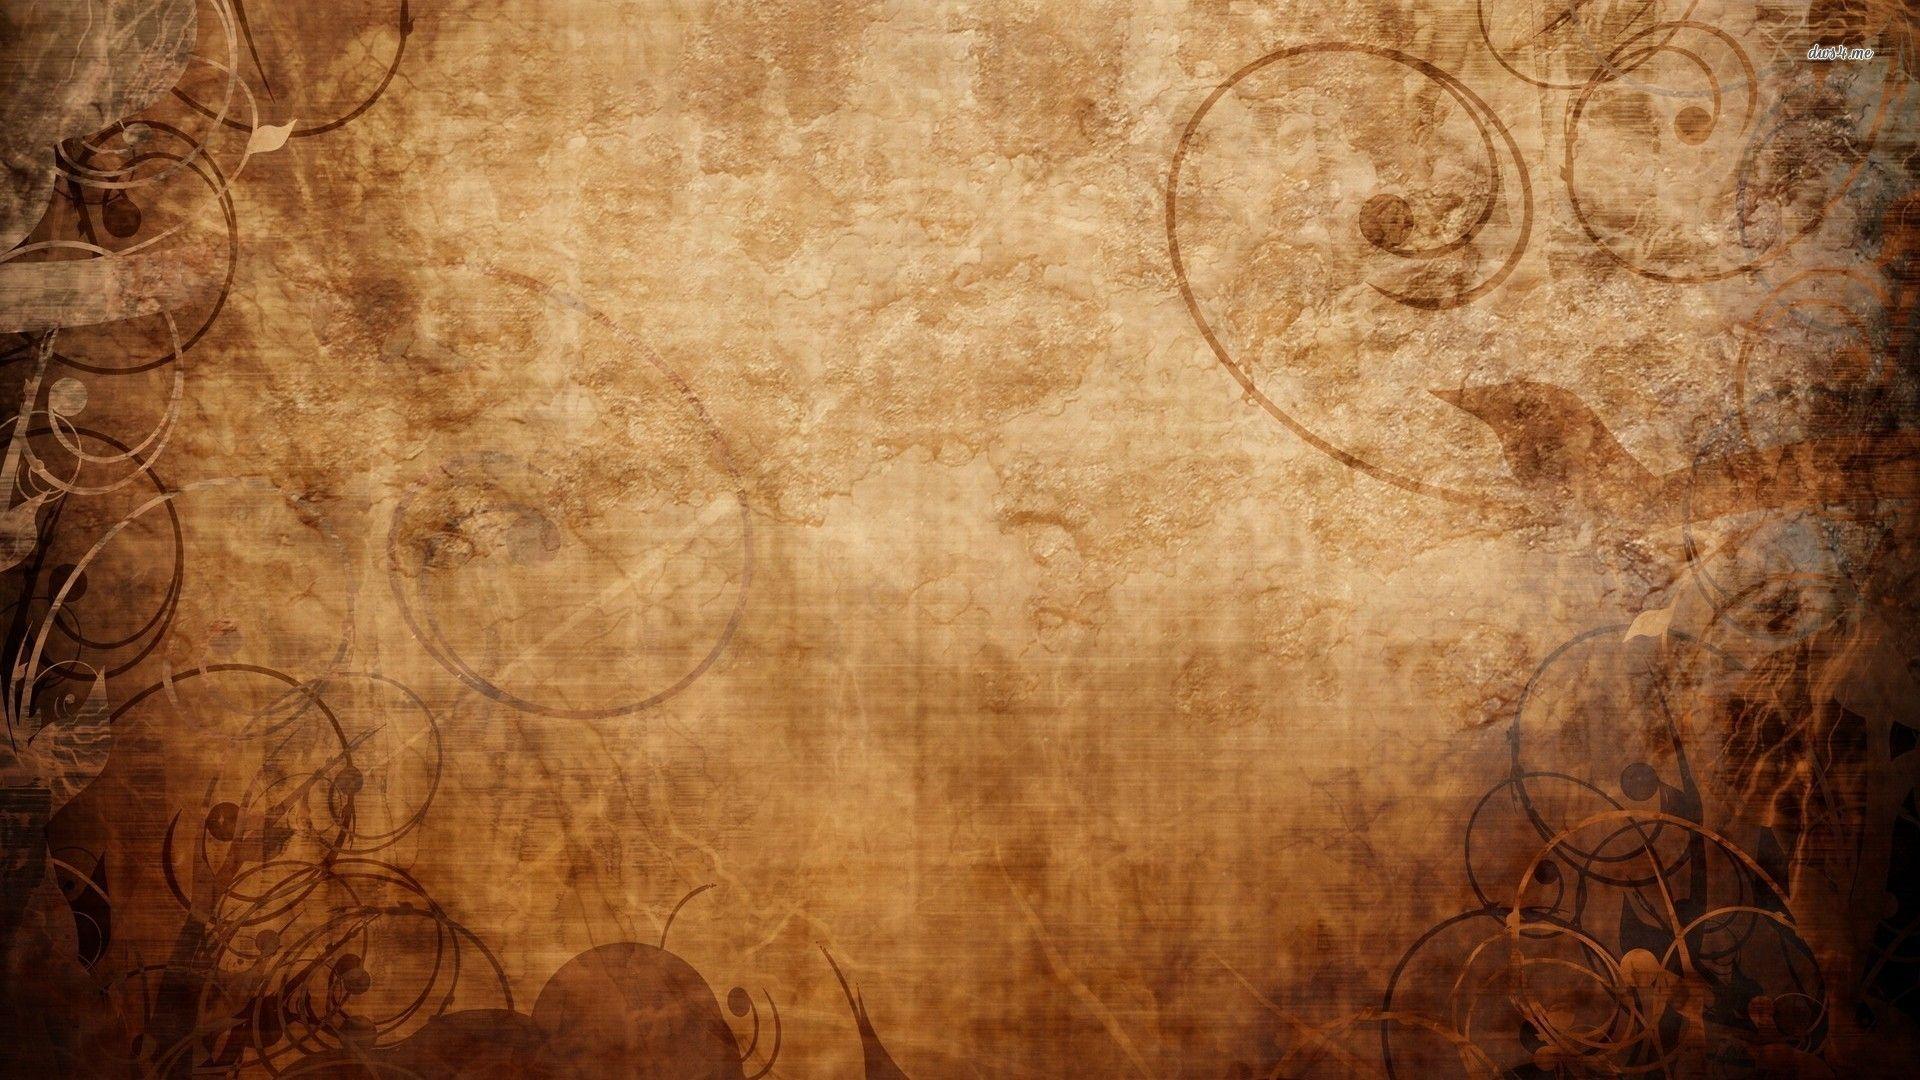 download Old World Map Desktop Wallpaper 1920x1080 for iPad 2 1920x1080